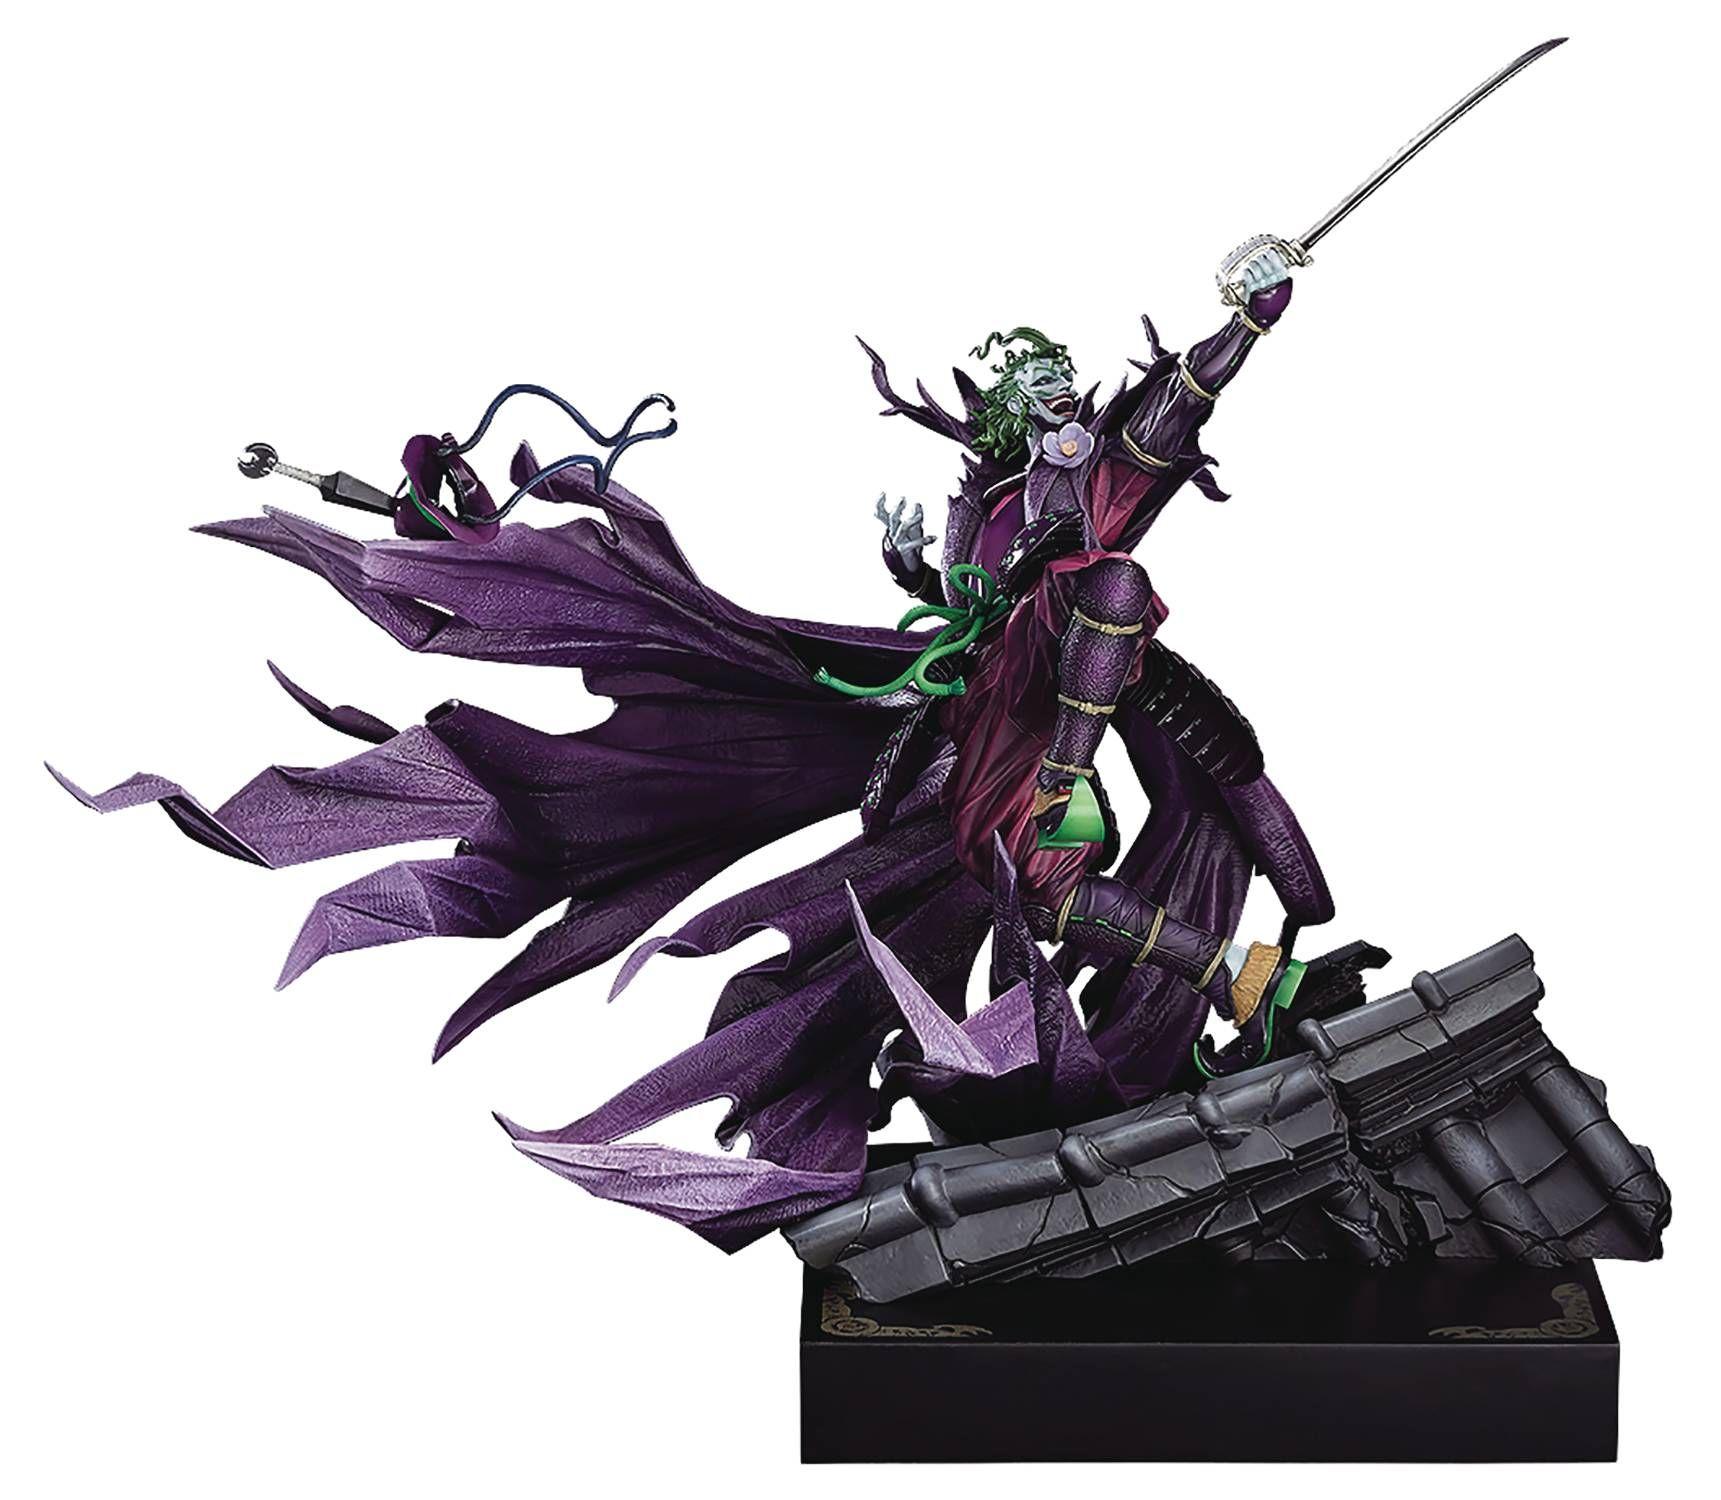 Batman Ninja Wonderful Hobby Selection Joker Takashi Okazaki Ver 1 6 Scale Limited Edition Statue Batman Ninja Takashi Batman Collectibles